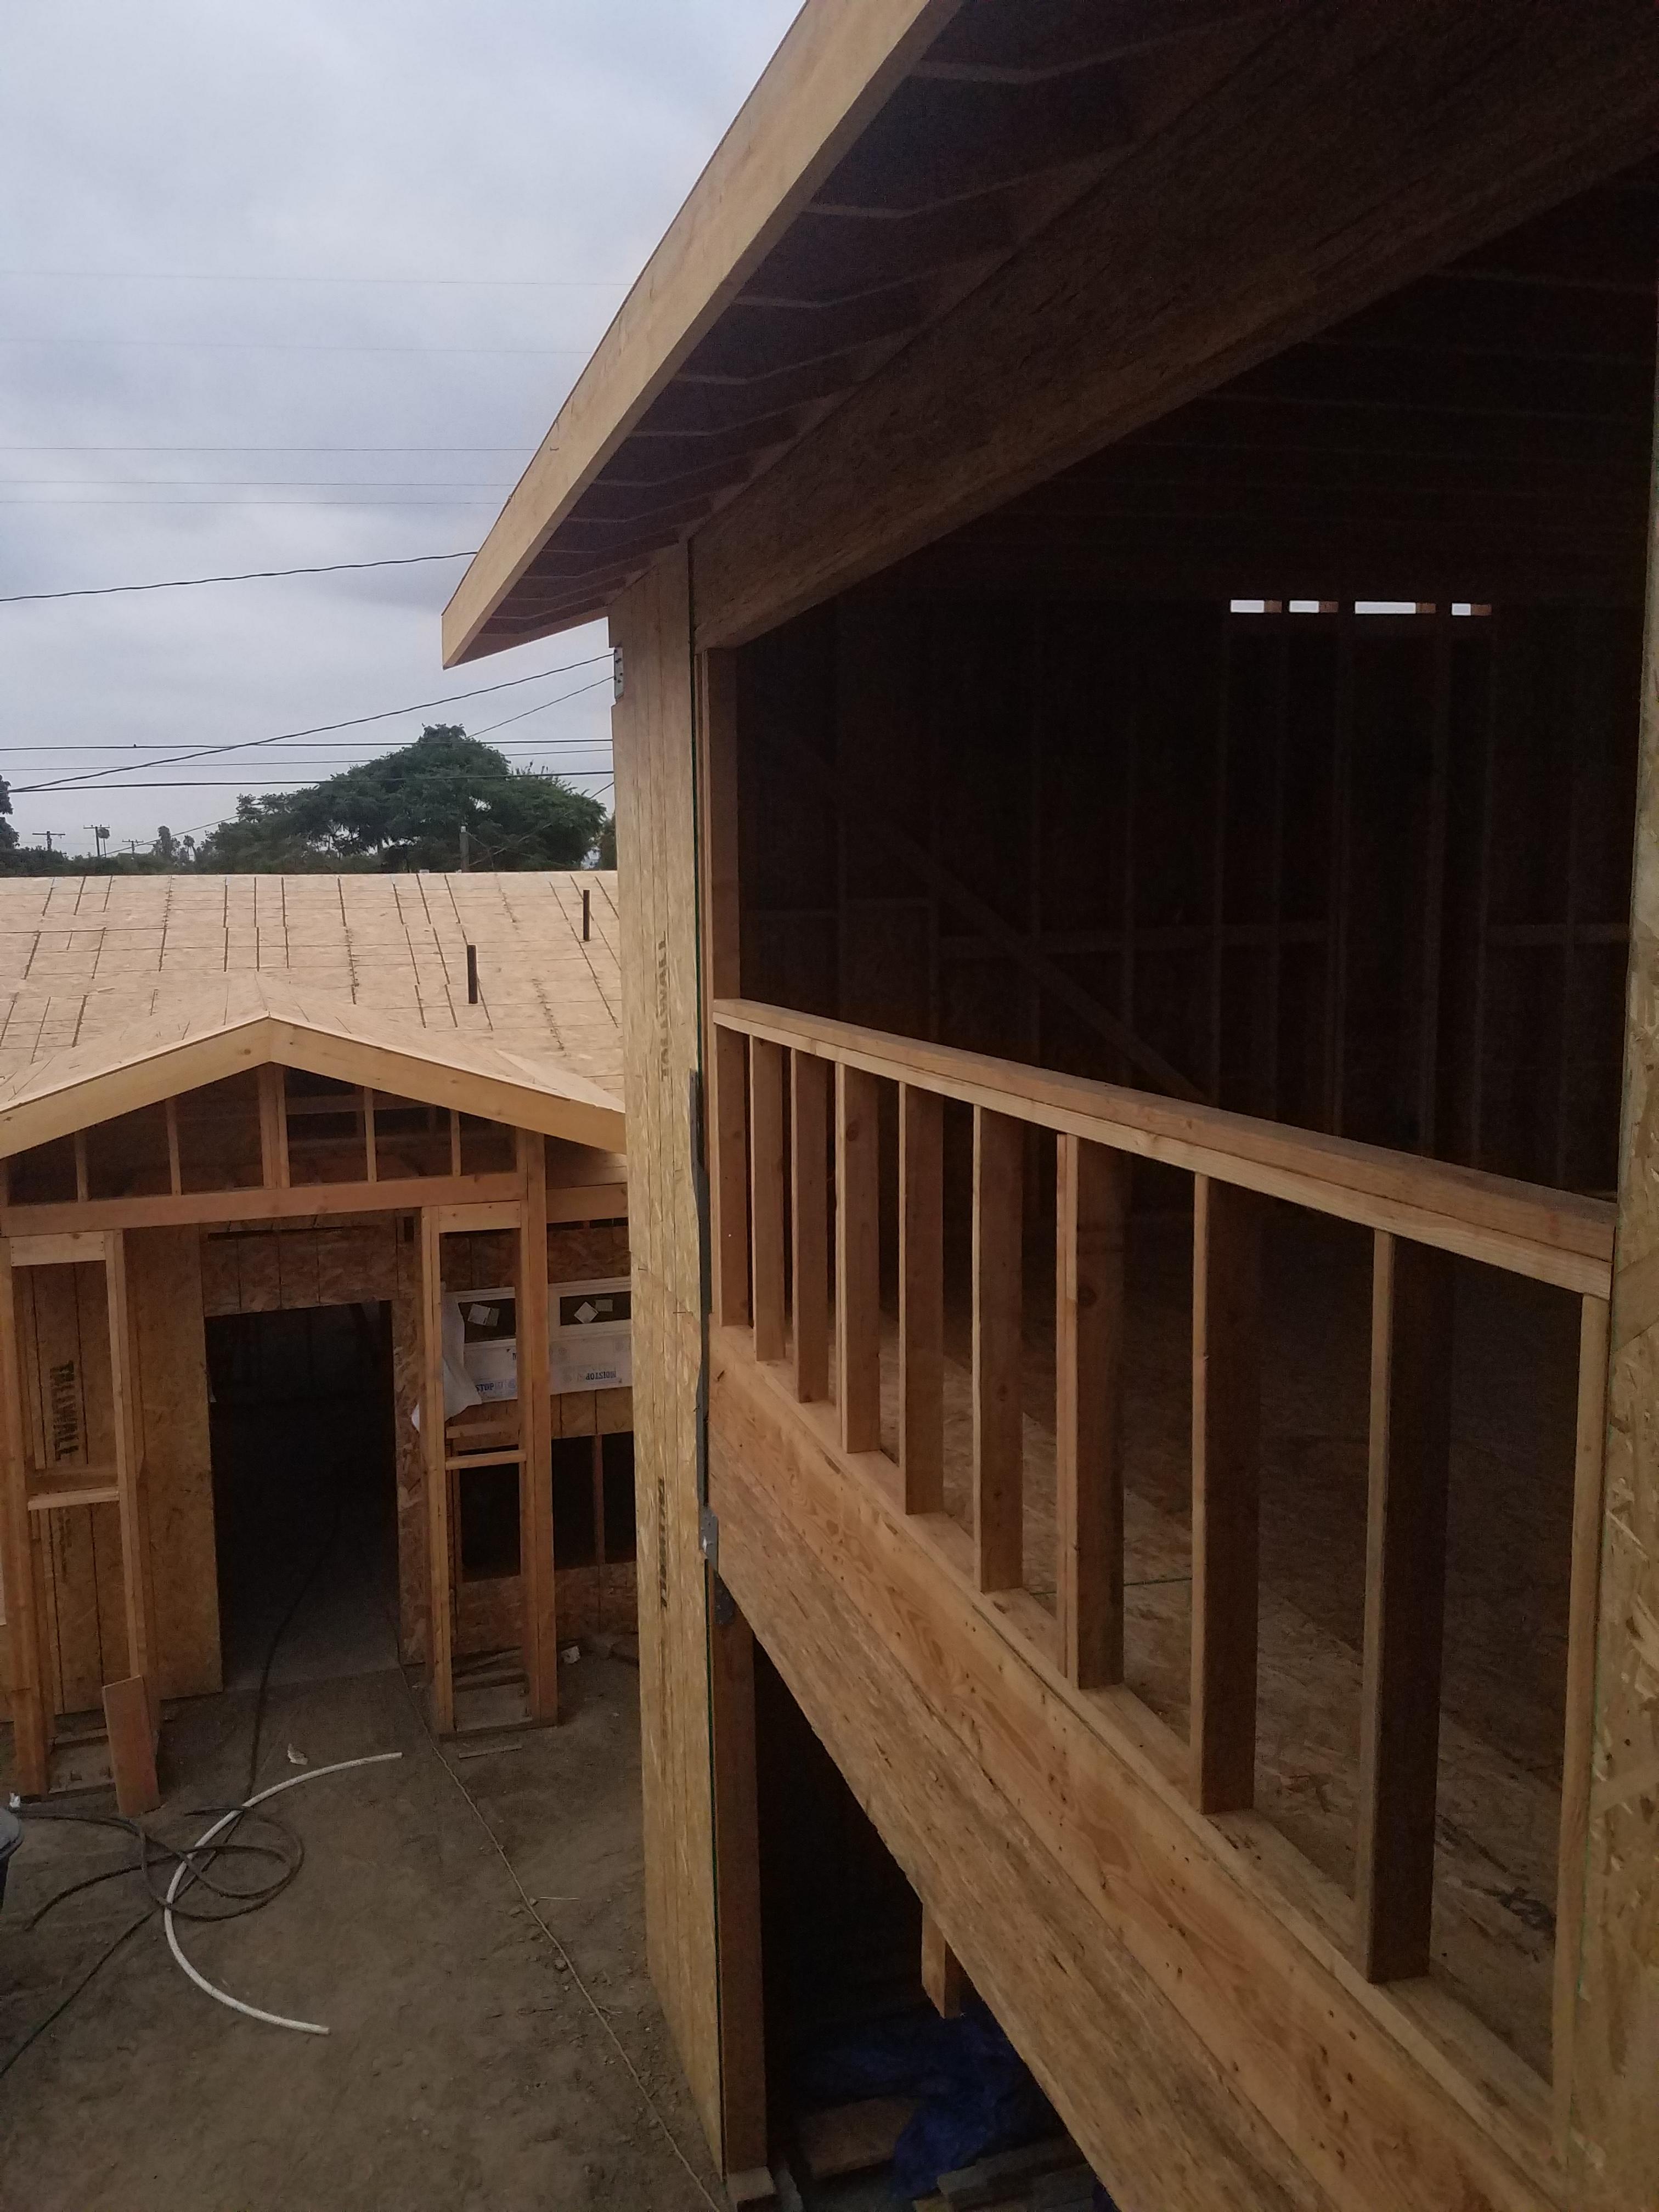 All Season General Construction. image 1